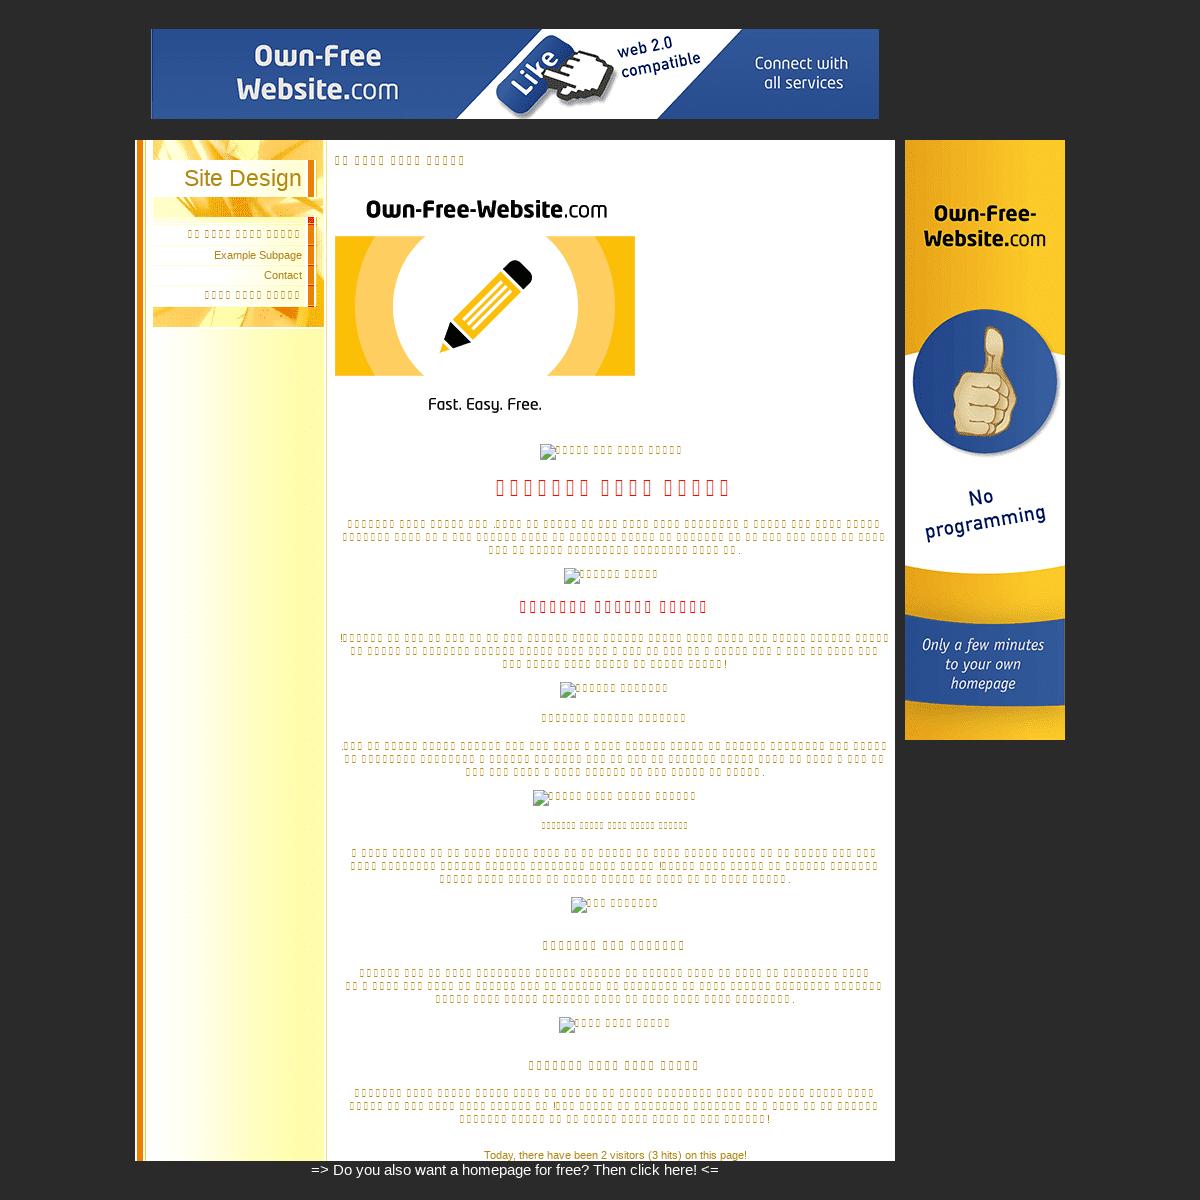 ArchiveBay.com - wpplugin111.page.tl - Site Design - طراحی سایت حرفه ای